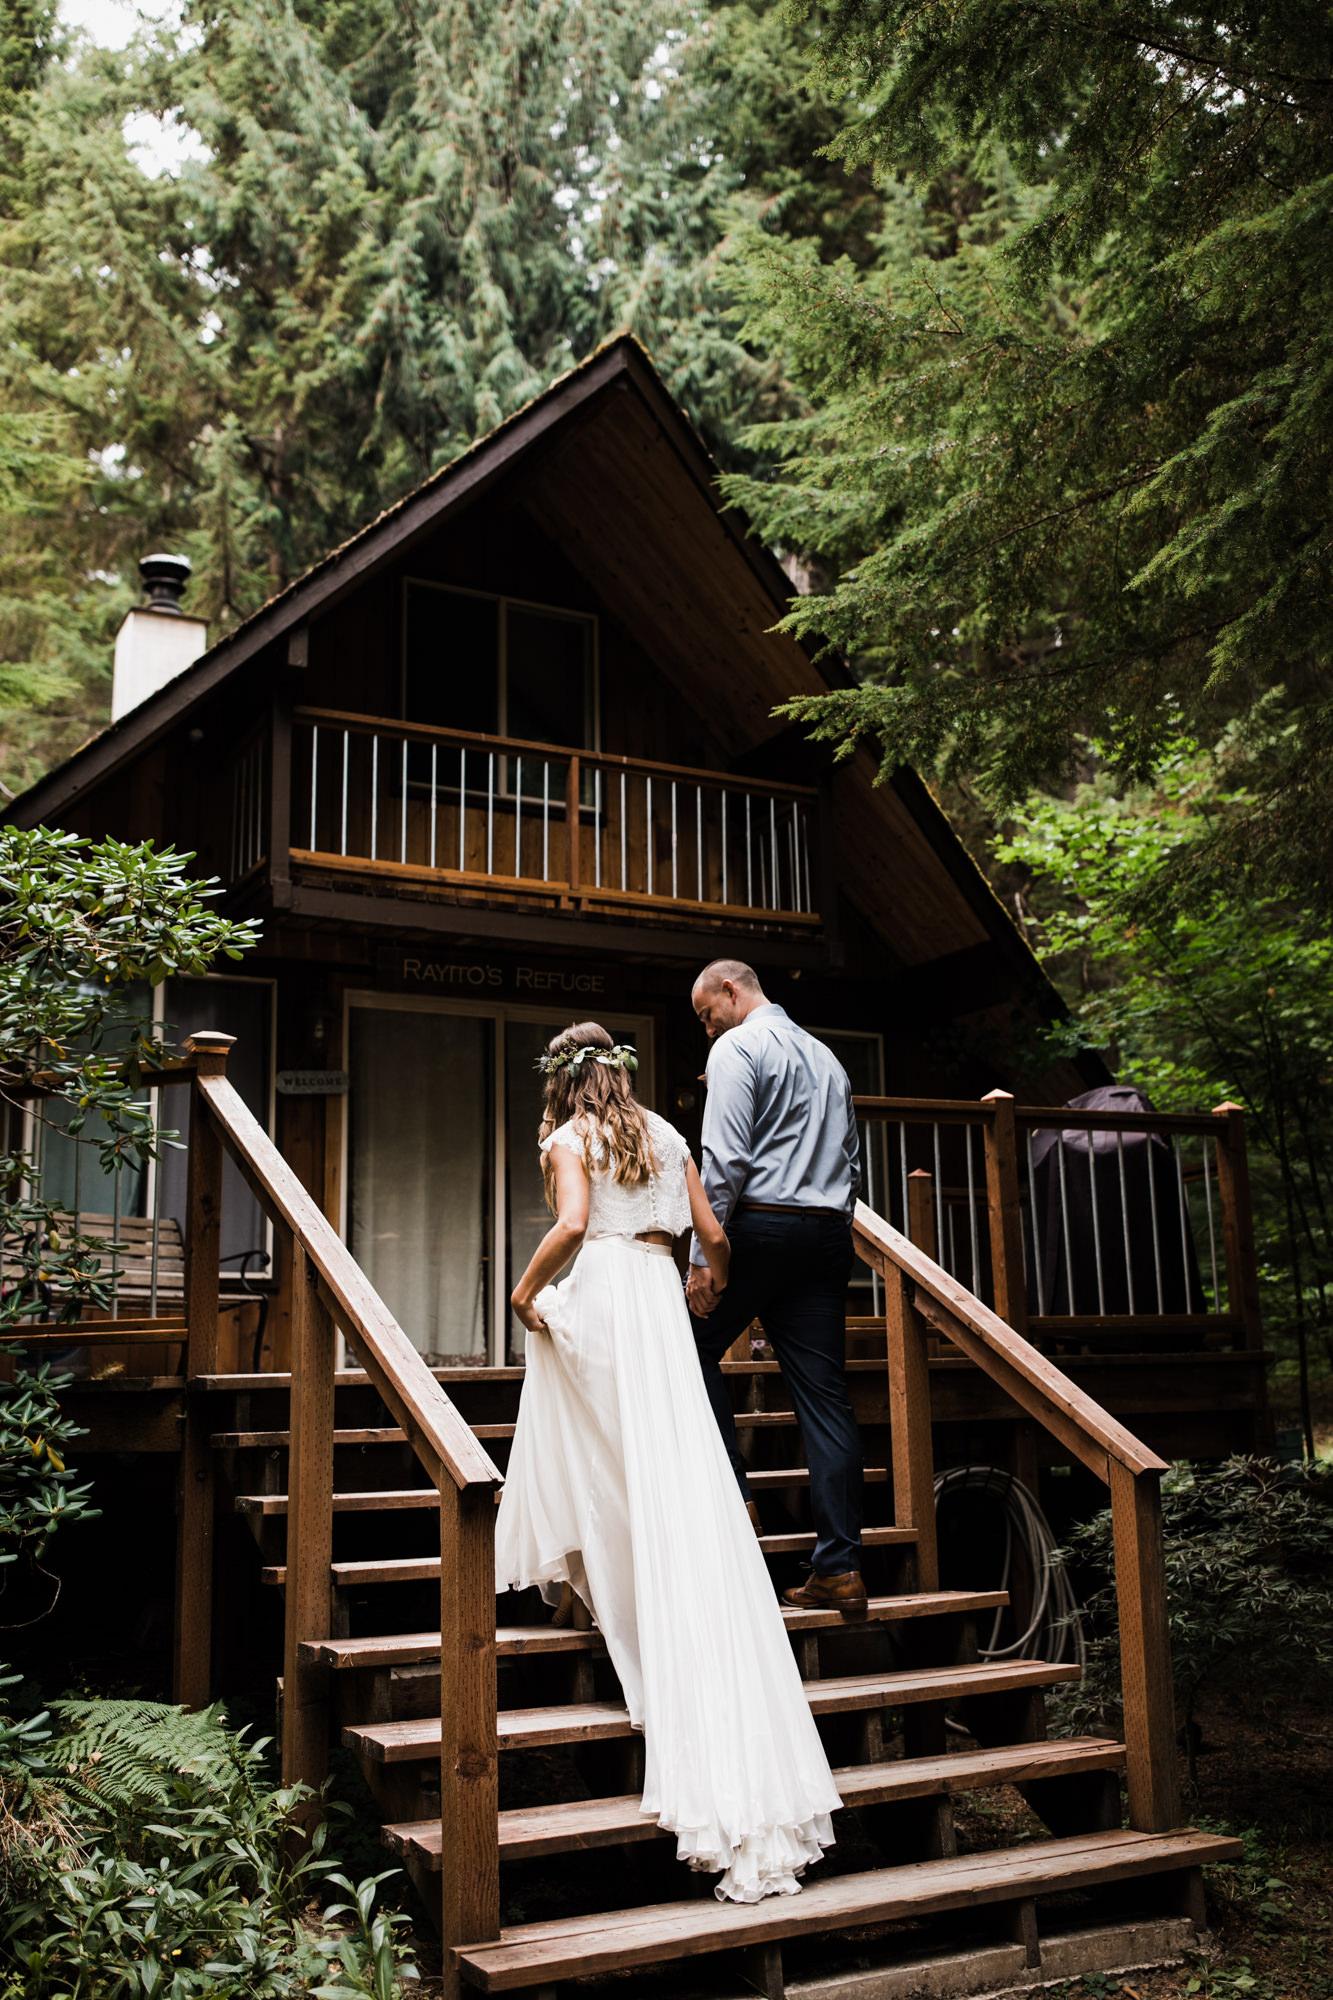 cabin in the woods elopement near mount rainier national park | destination adventure wedding photographers | the hearnes adventure photography | www.thehearnes.com